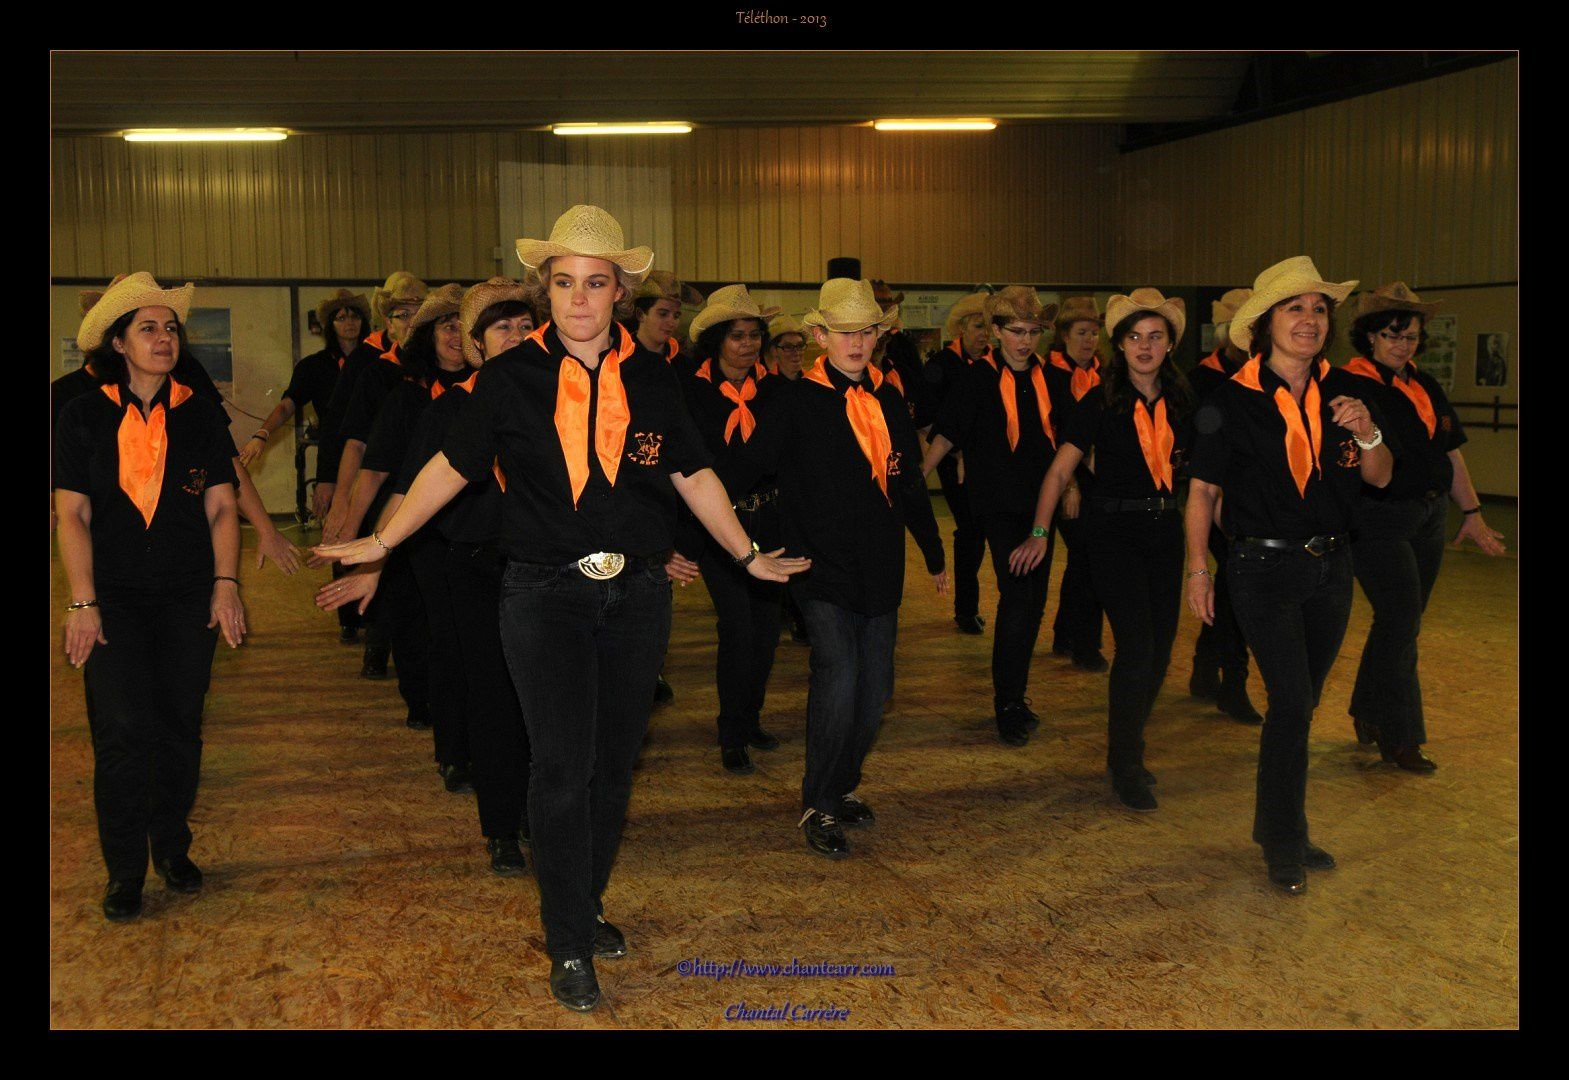 Musique et danse Country en GirondeReportages photos Dautres photos sur mon blog http